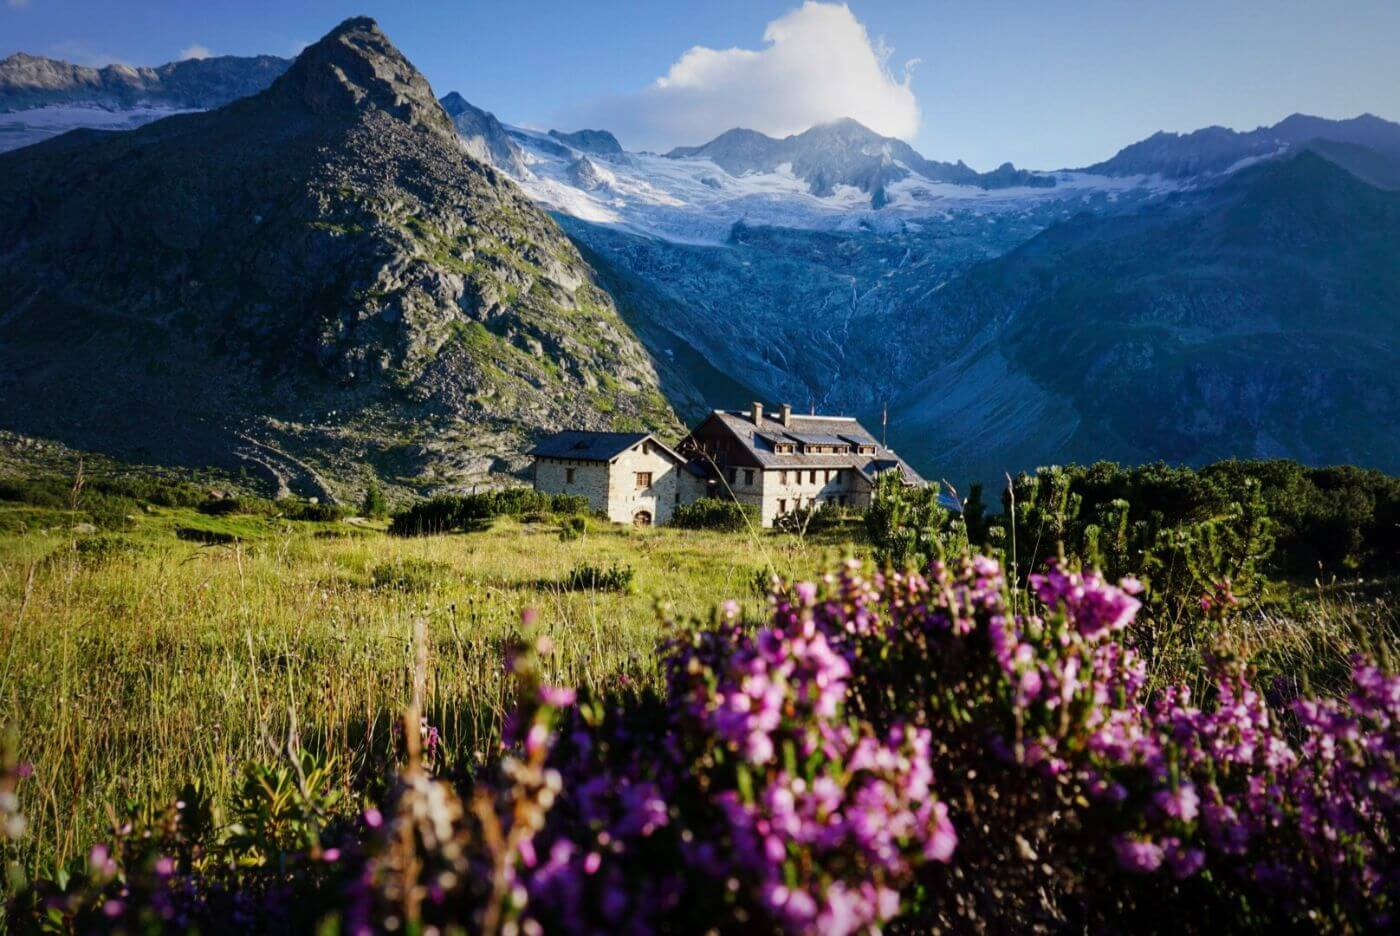 Berliner Hütte, Berlin High Trail trekking guide, Tyrol, Austria